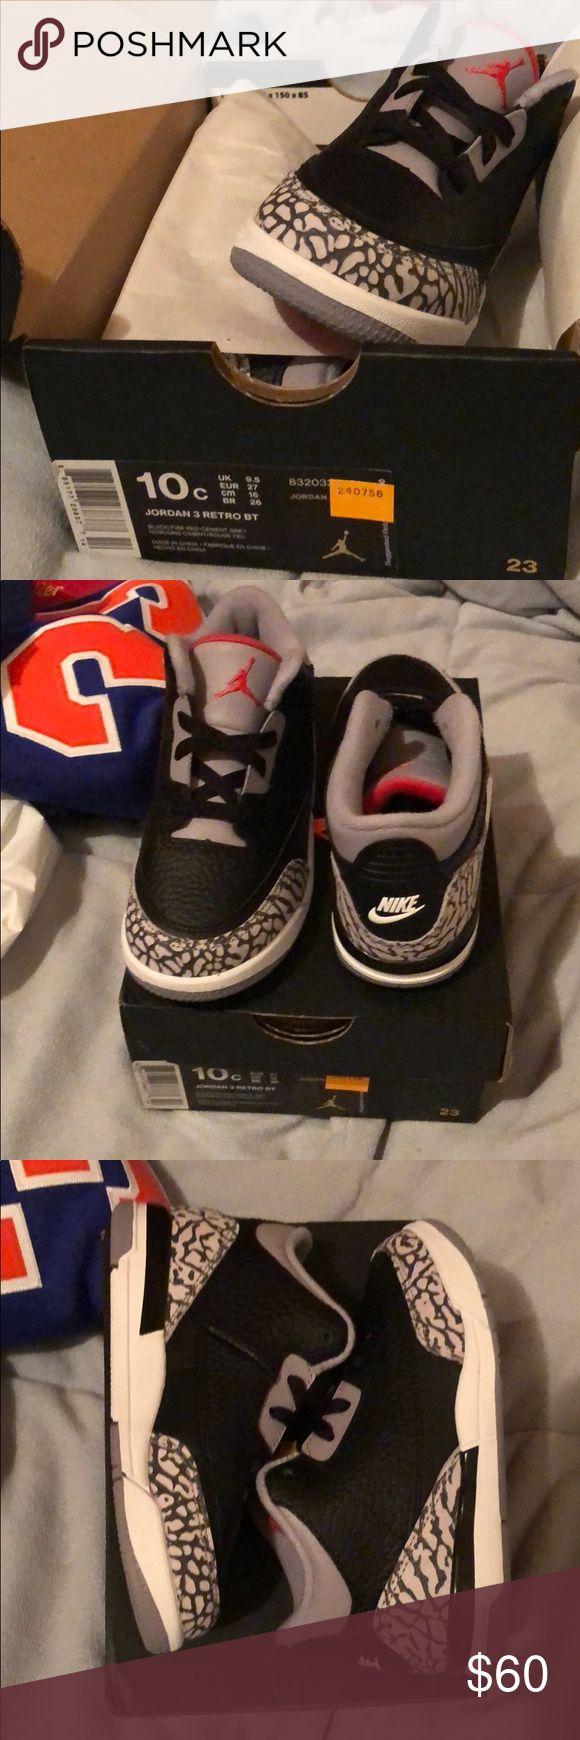 Size 10c Cement Jordan 3 OG Cement Jordan 3 OG size 10c Jordan Other